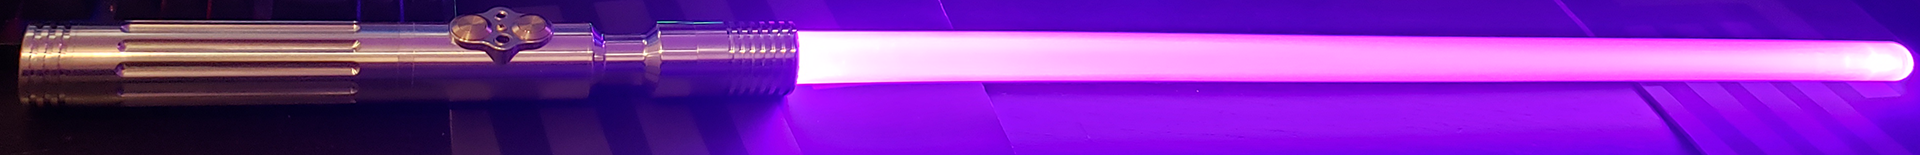 StJude-Purple